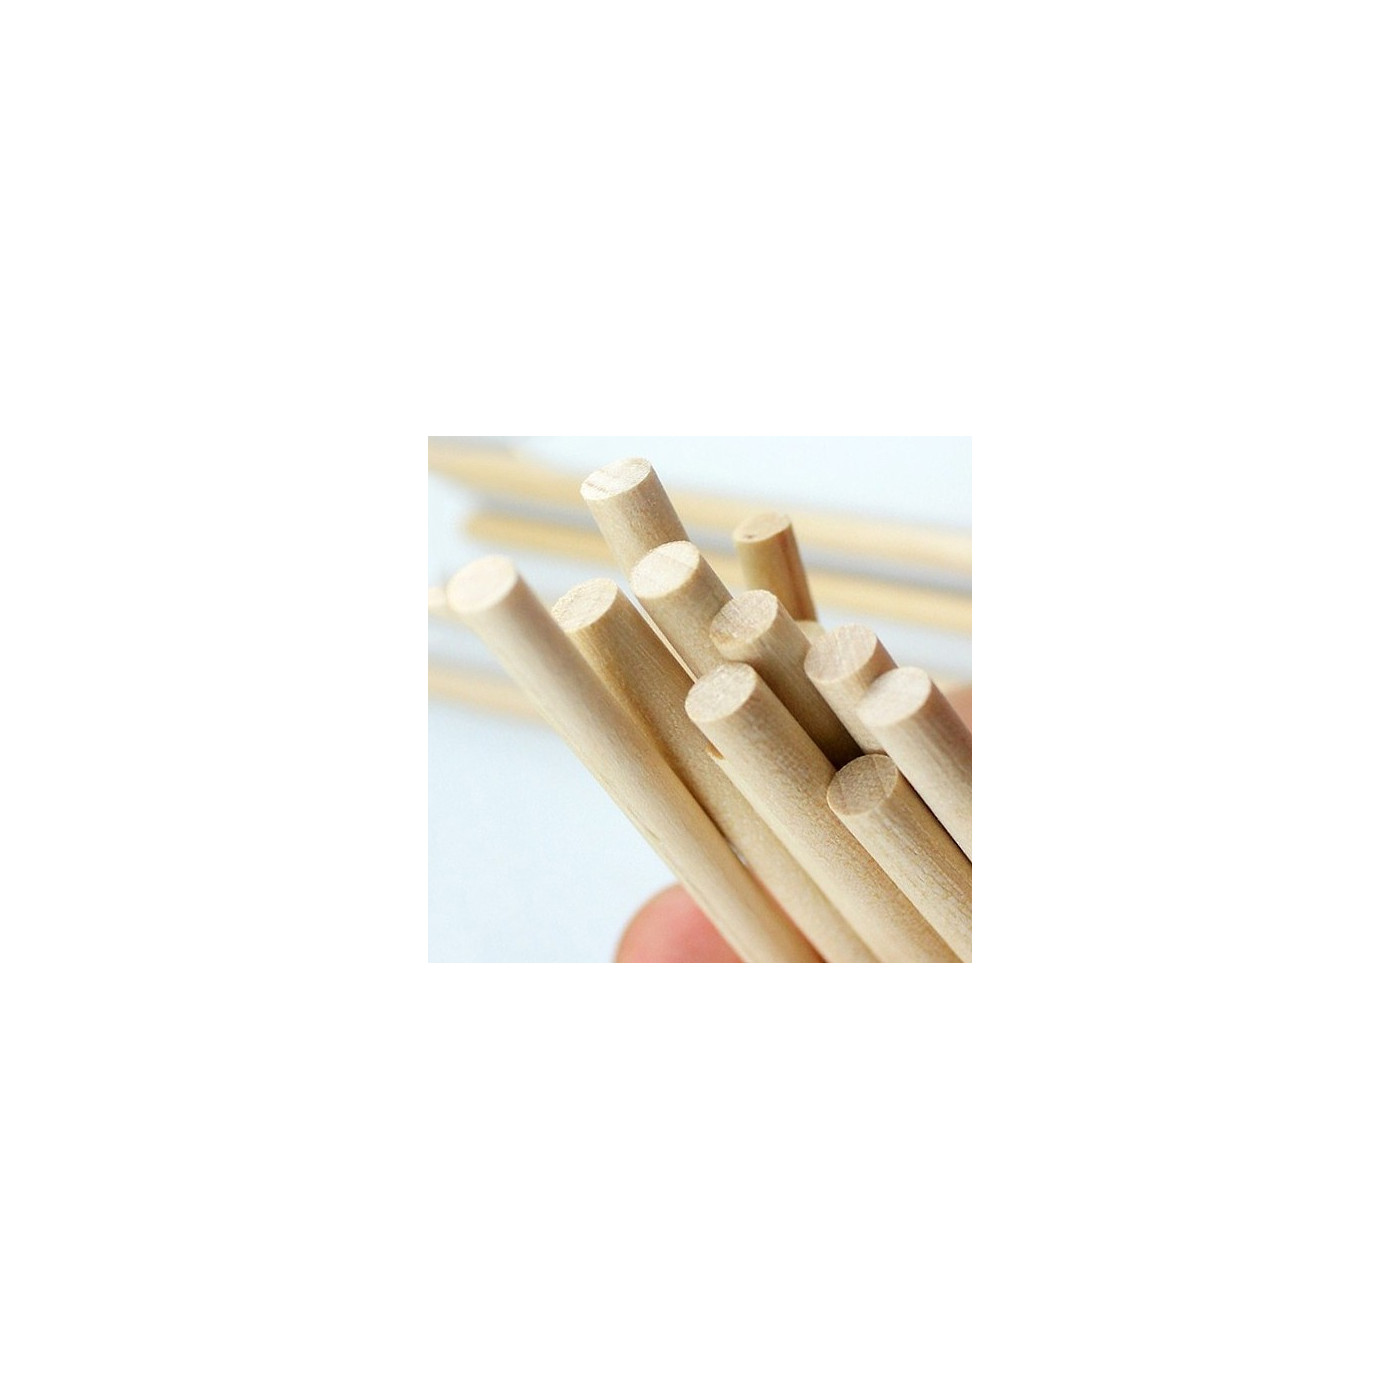 Juego de 400 palos de madera (11 cm de largo, 5 mm de diámetro, madera de abedul)  - 1